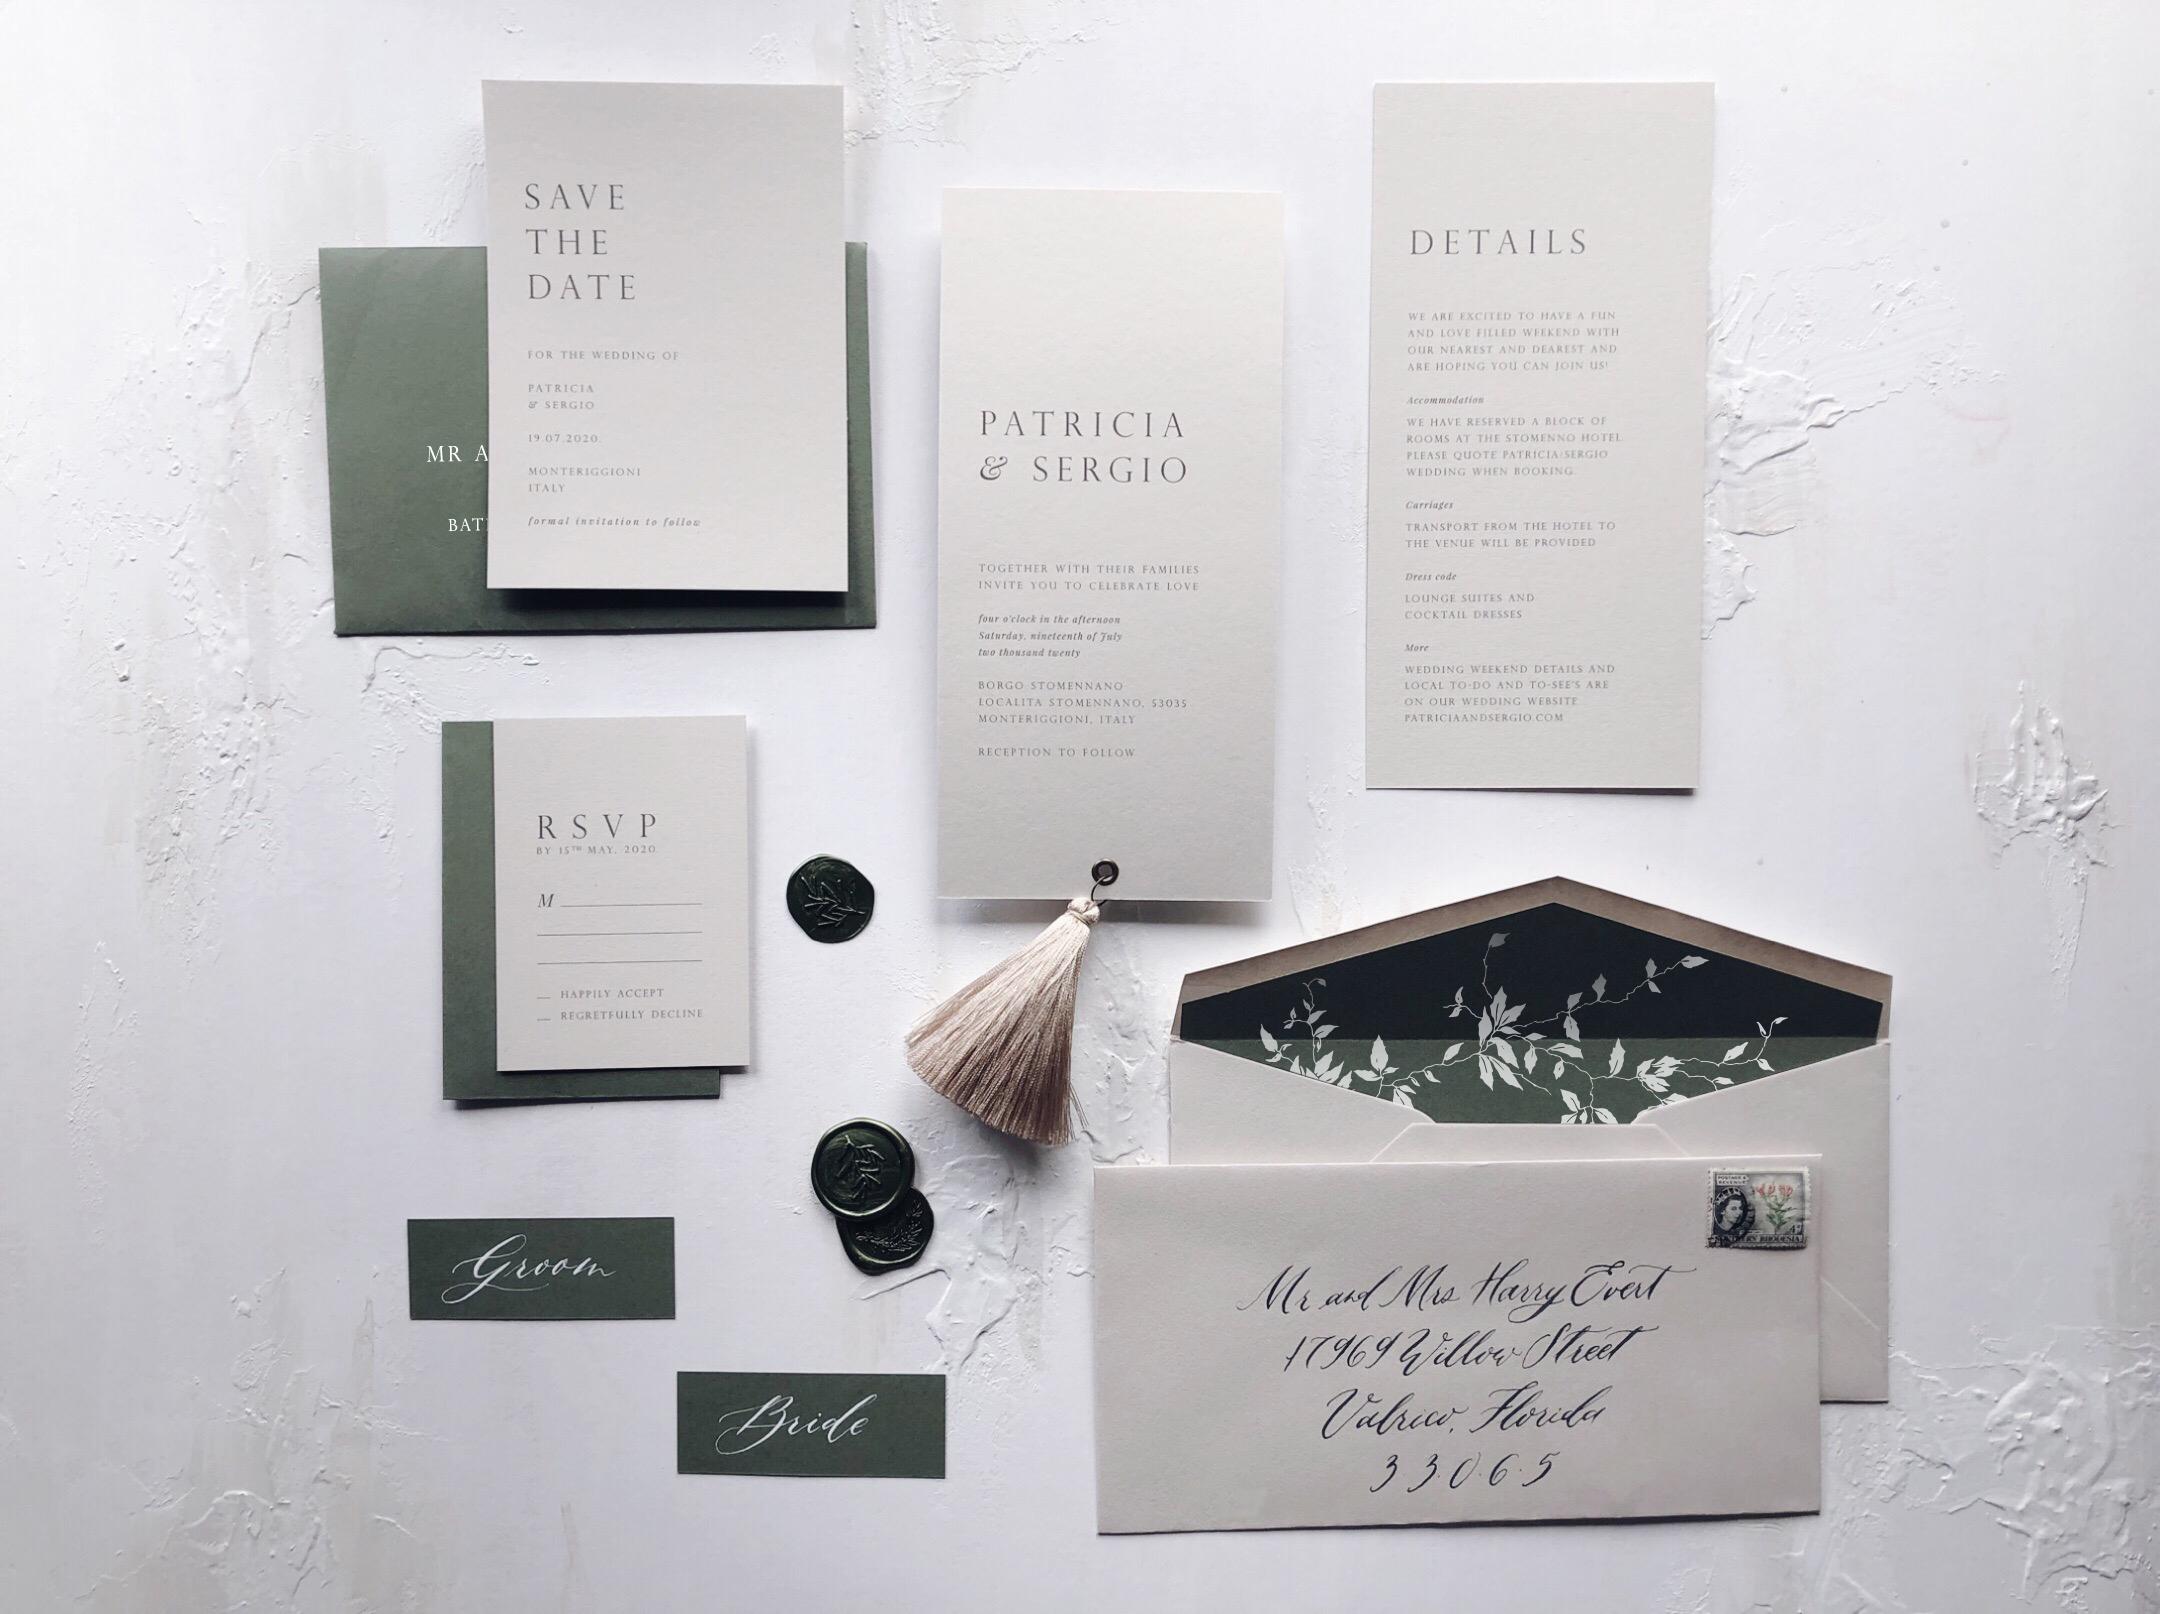 fine_art_wedding_invitations_2